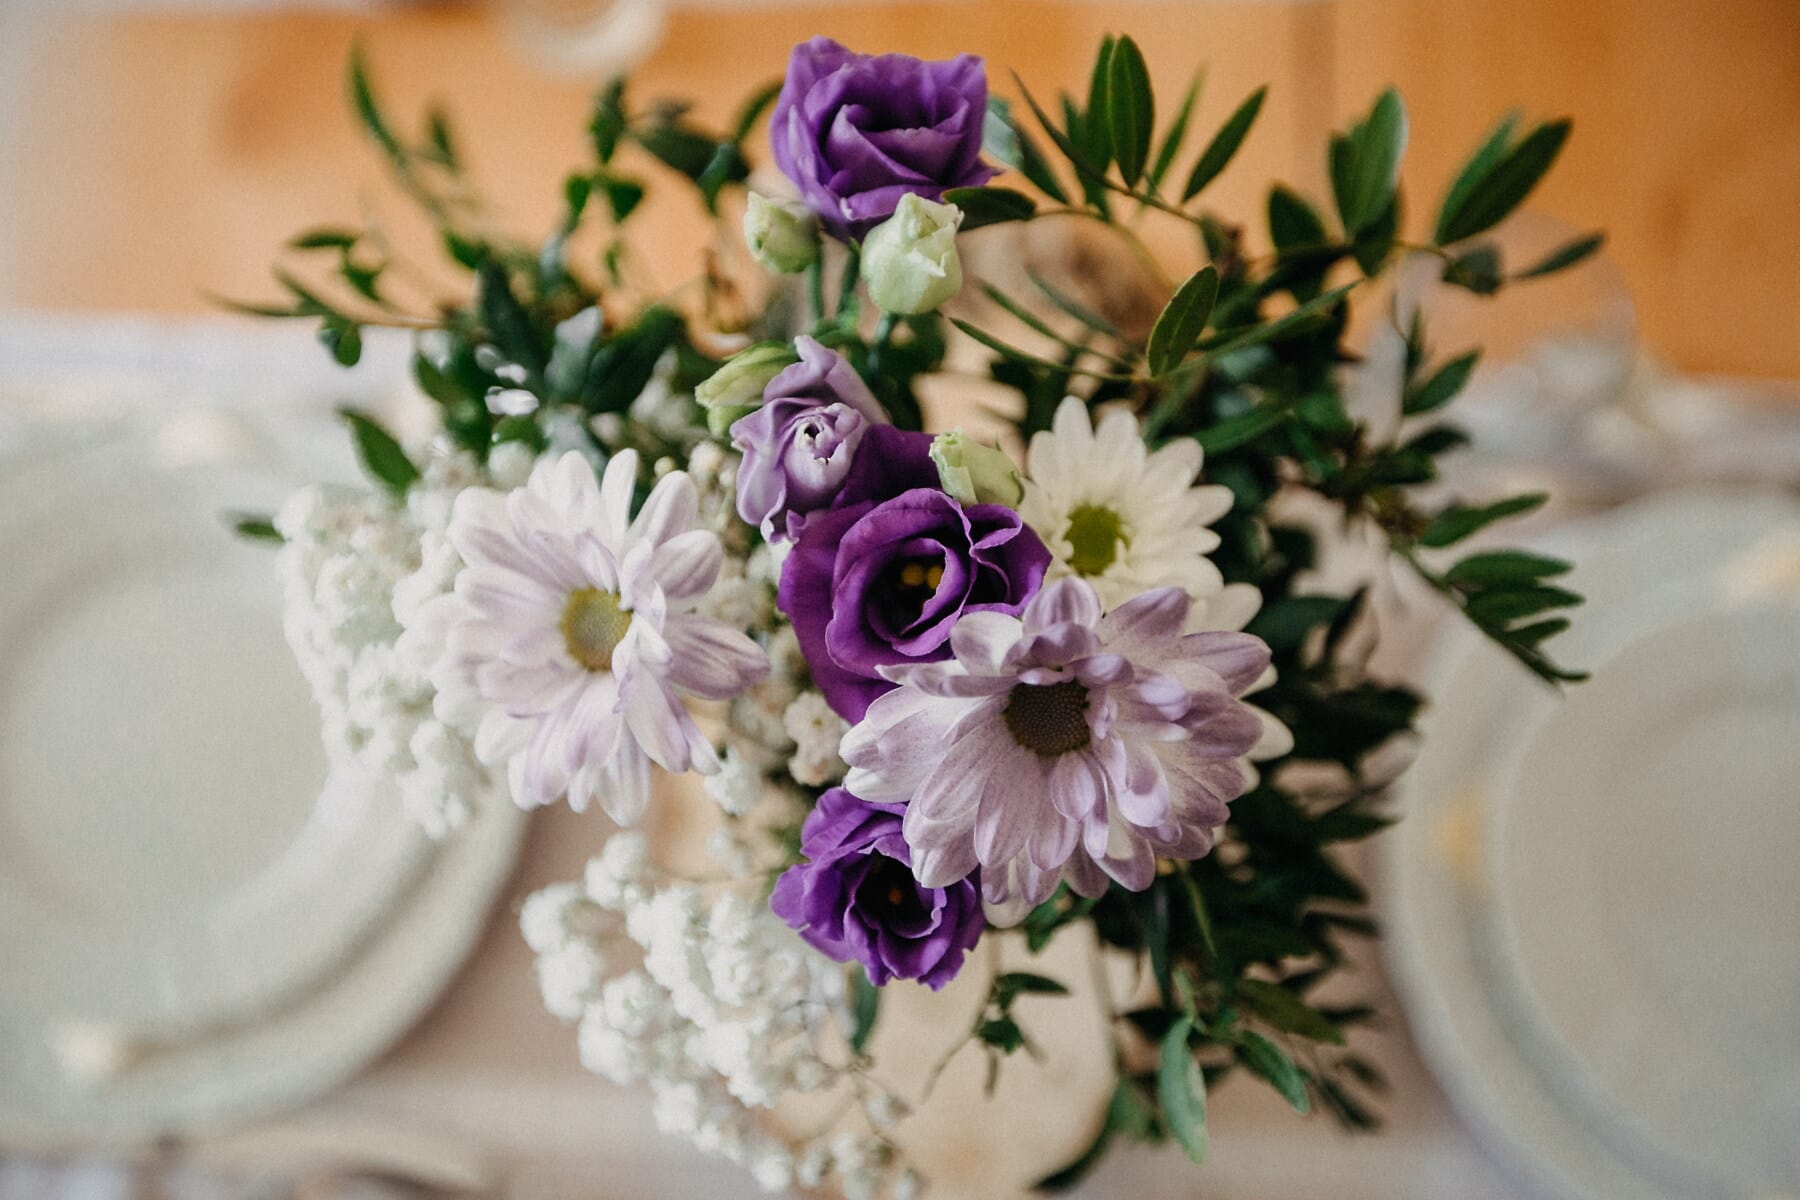 purplish, white, flowers, bouquet, roses, dining area, close-up, flower, decoration, leaf